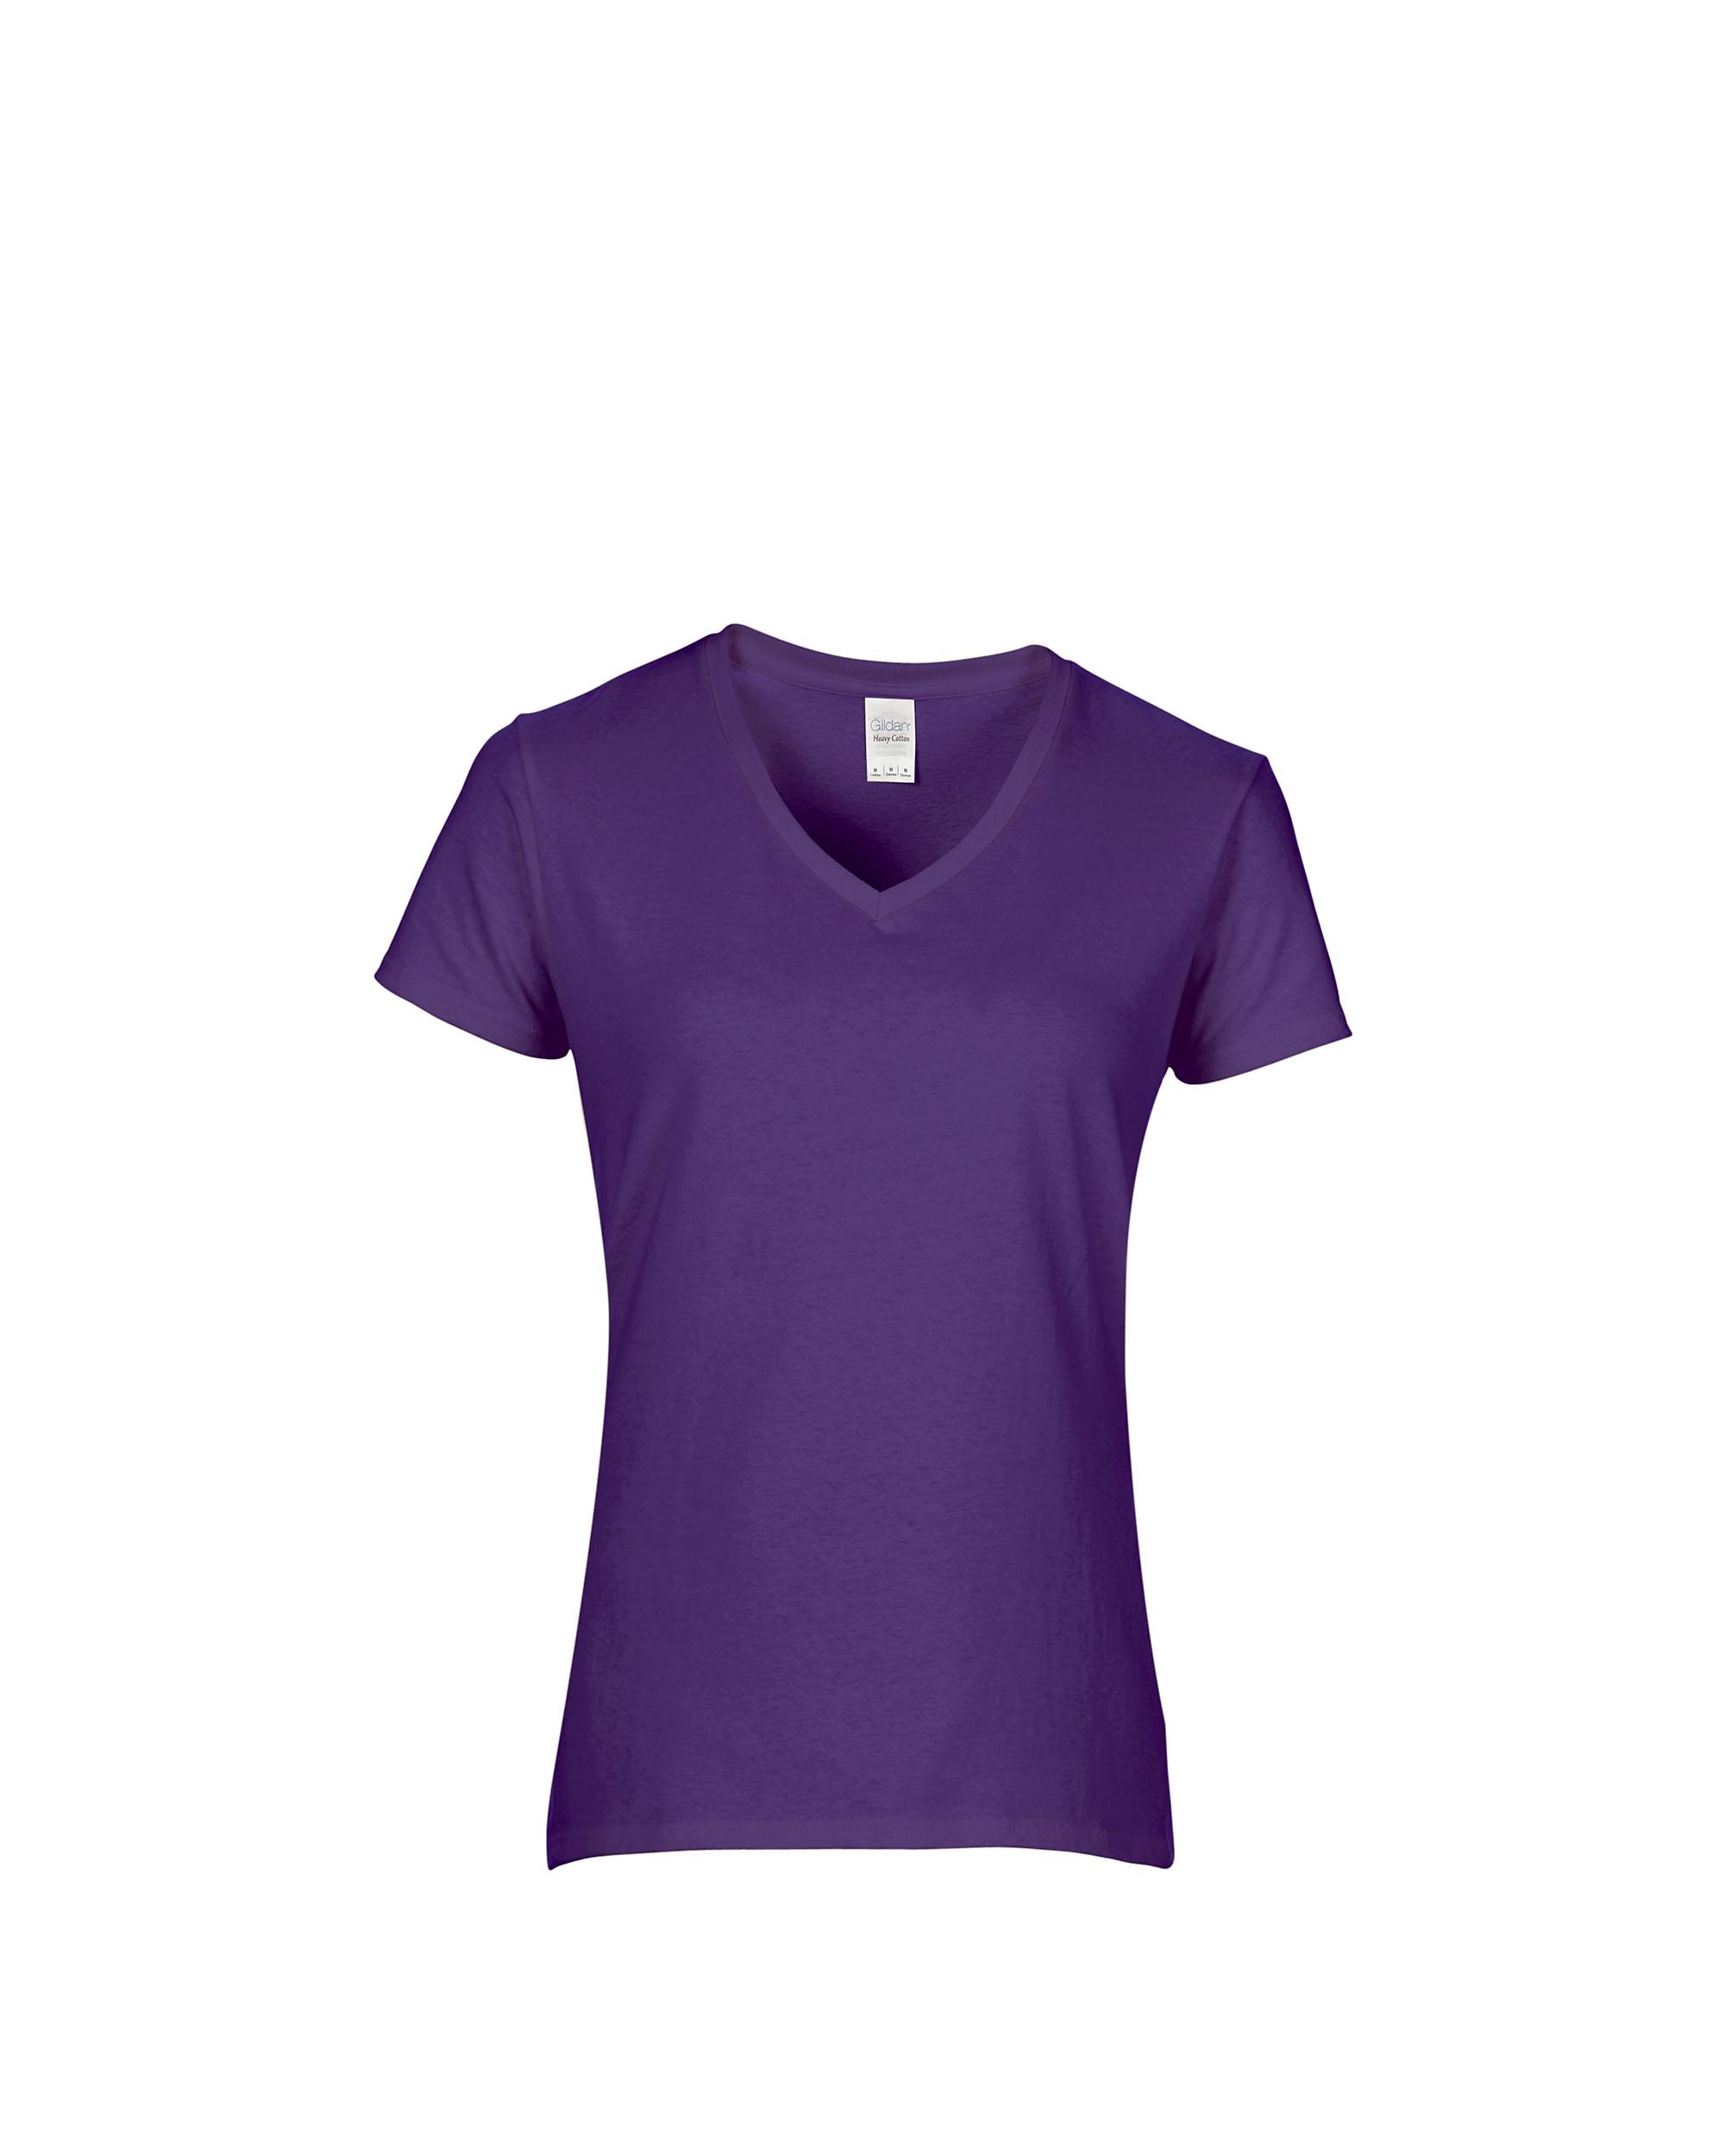 Women 39 S Soft Style Junior Fit V Neck T Shirt Team Shirt Pros